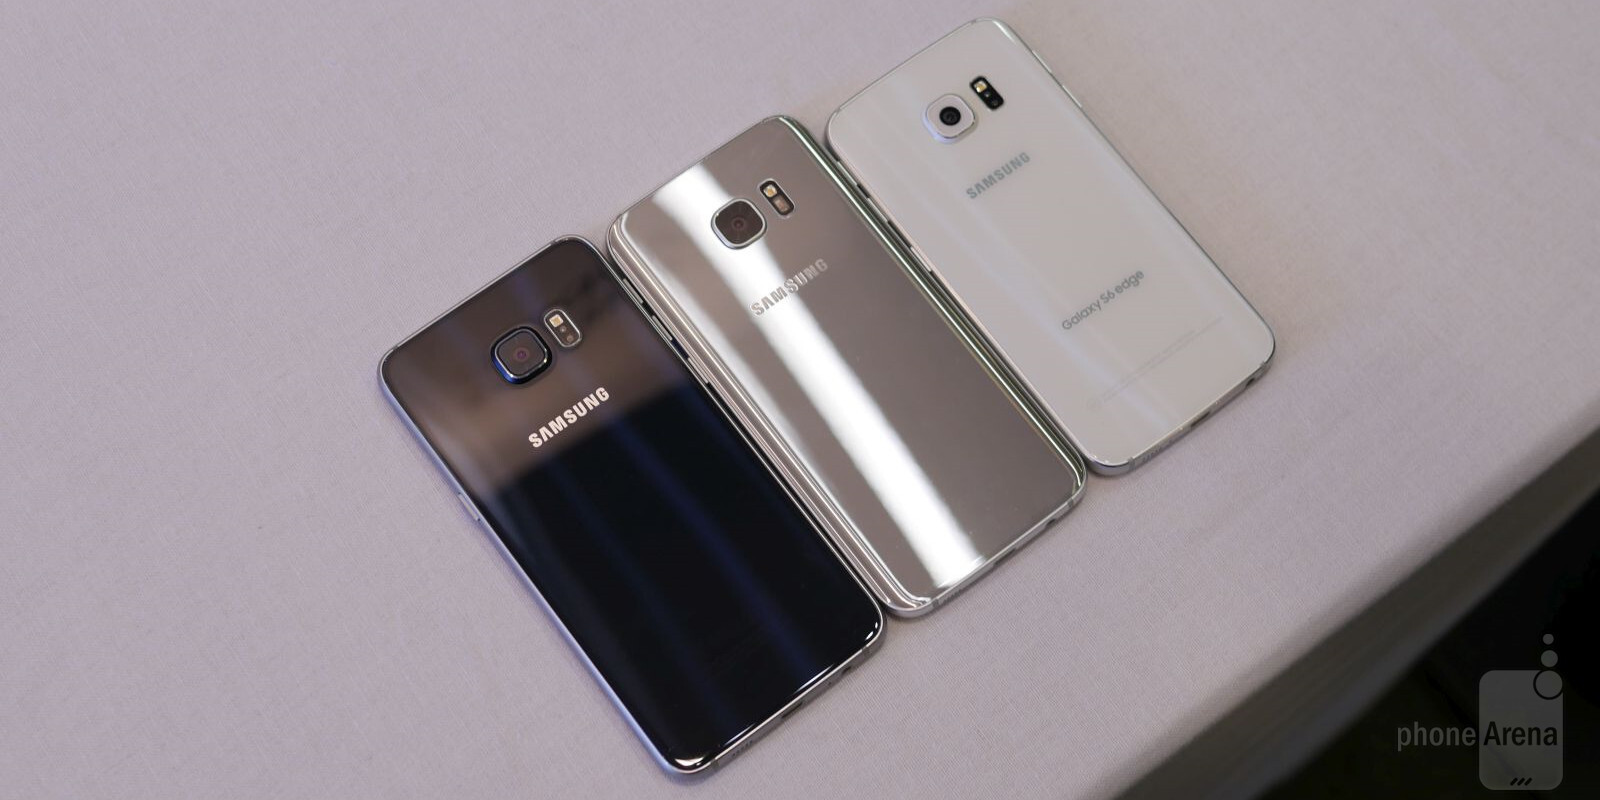 Samsung Galaxy S7 Edge Vs Samsung Galaxy S6 Edge Vs